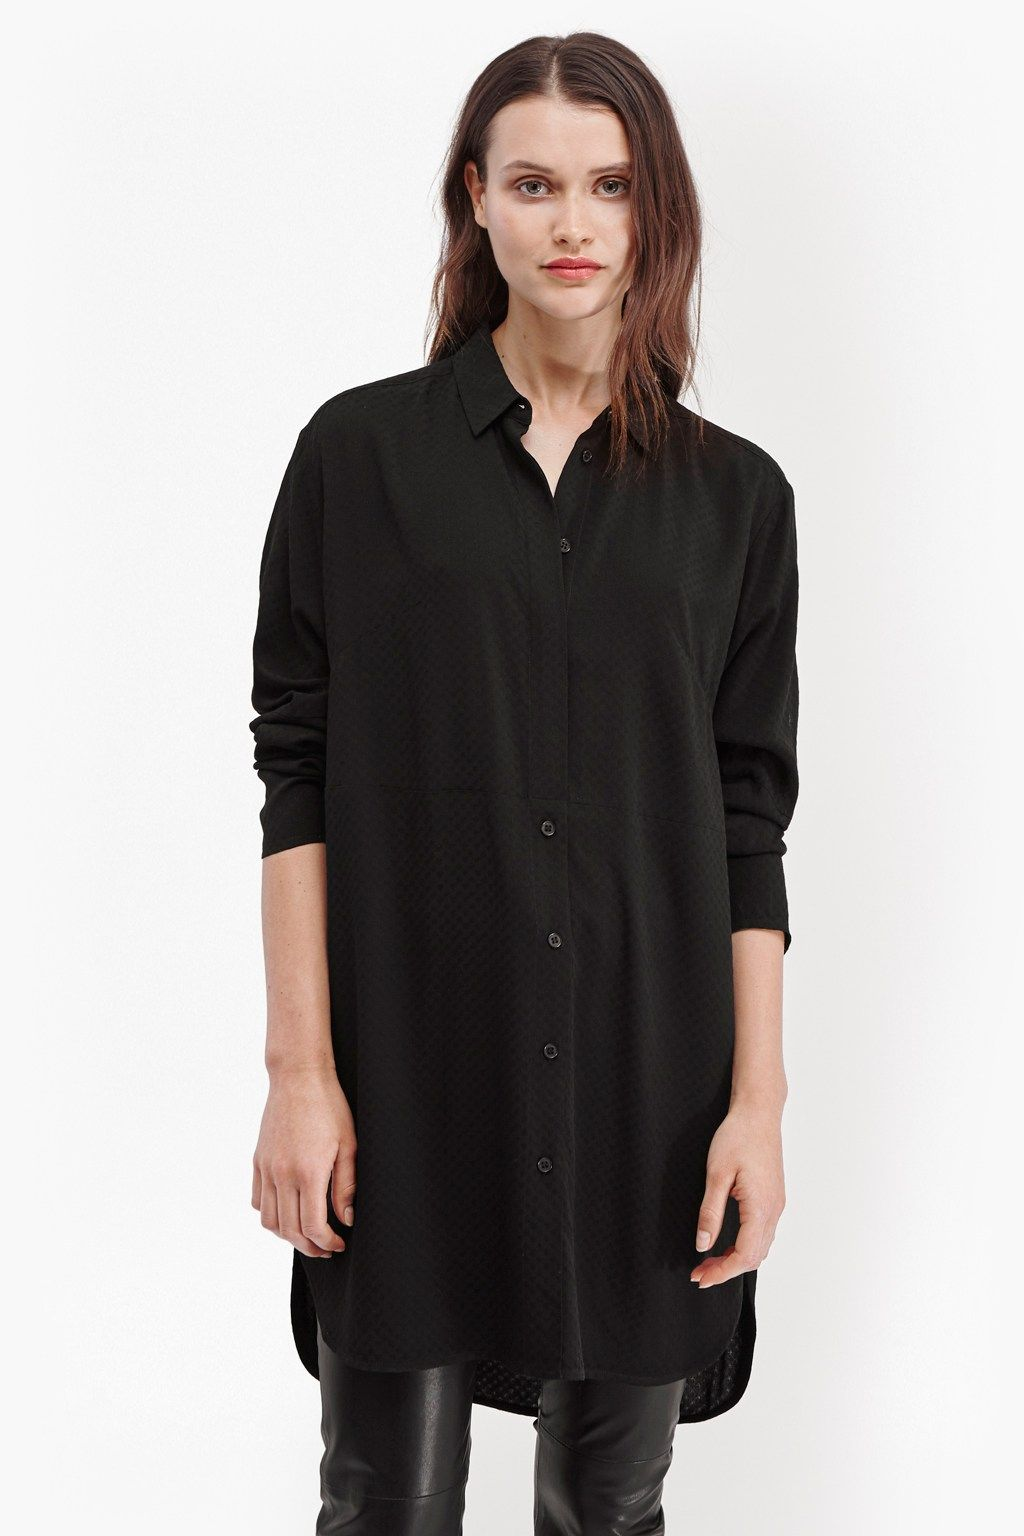 51b286a3871b5 Embroidery Dot Longline Shirt